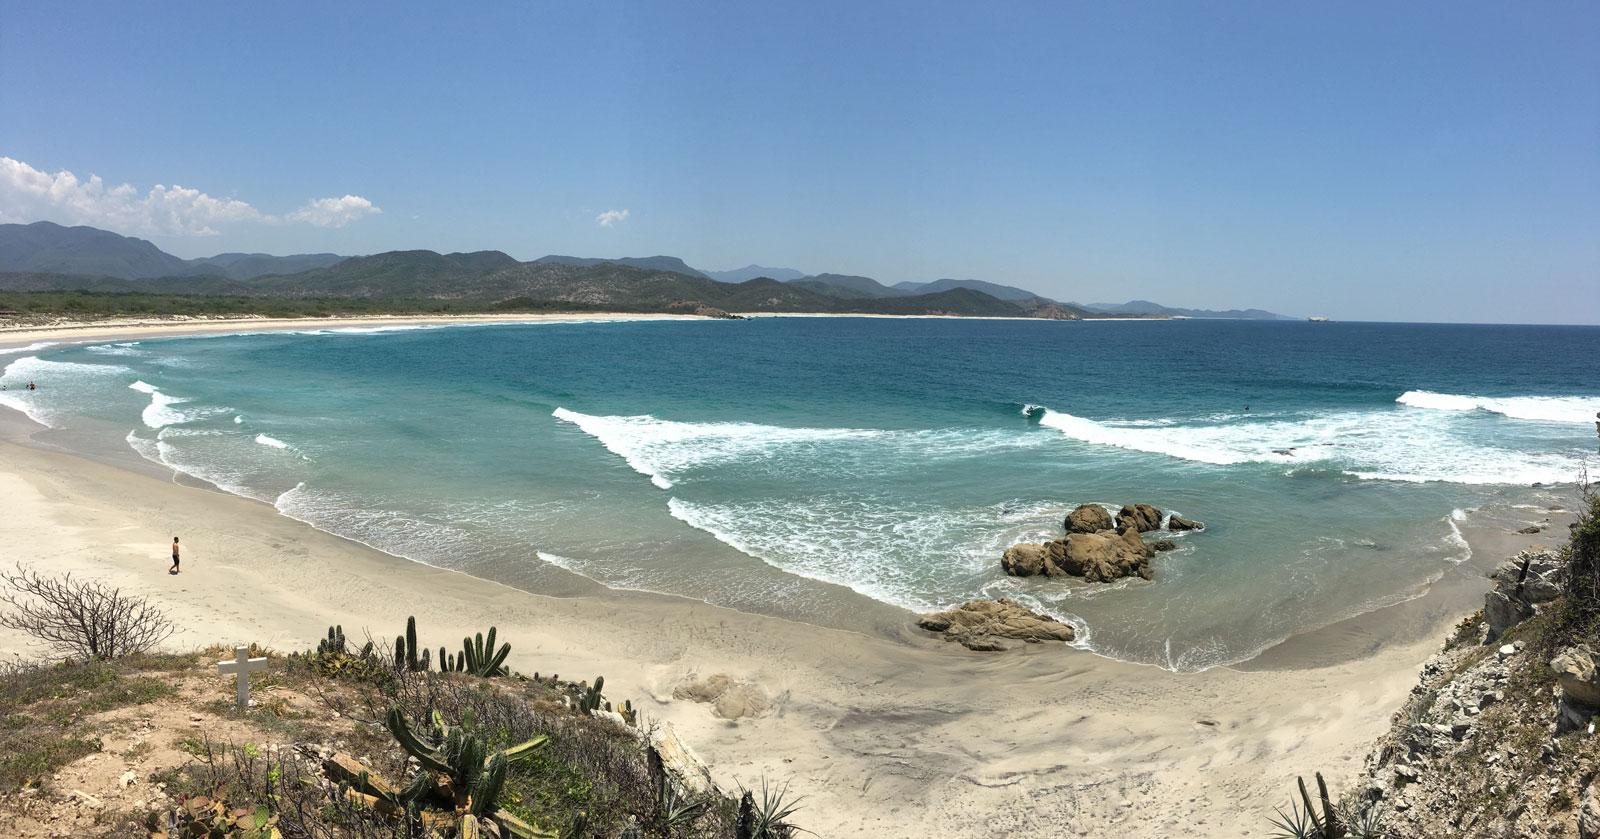 Mexico SalinaCruz